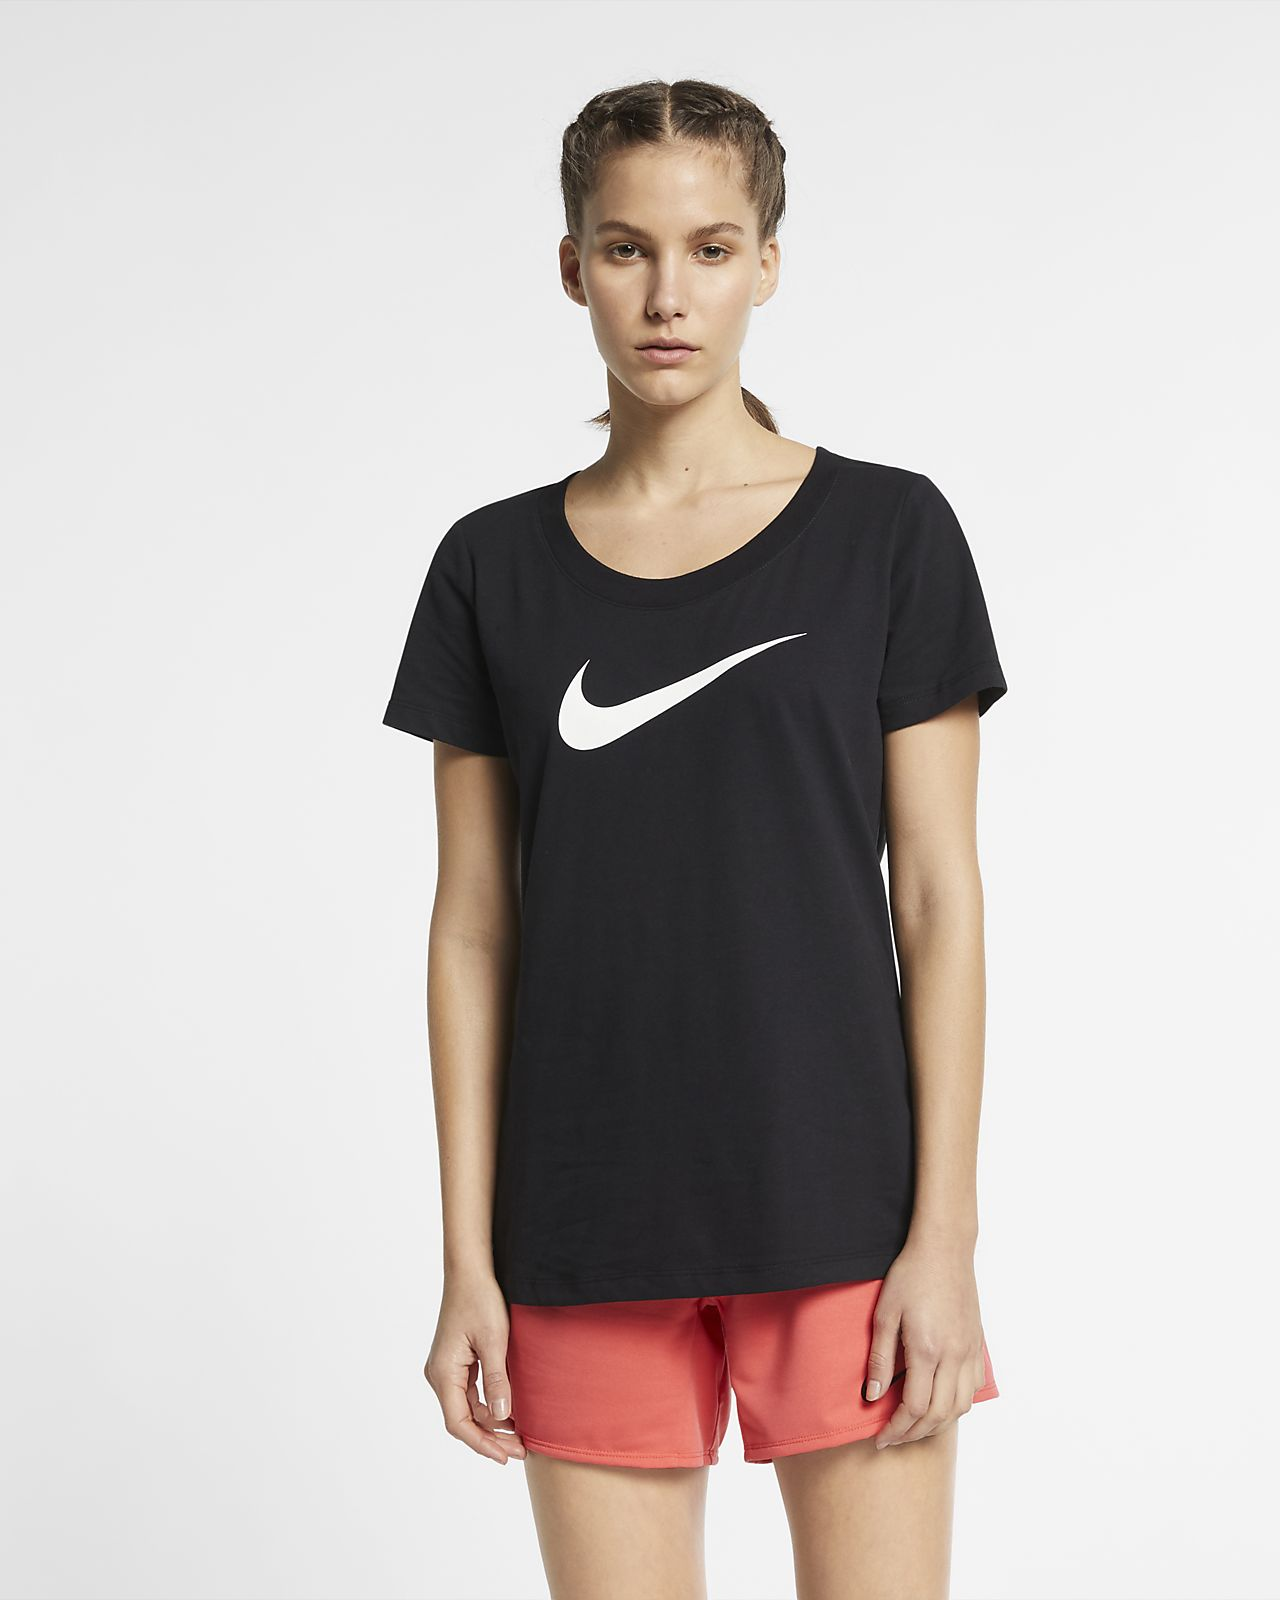 559d85b0ae2 NIKE公式】ナイキ Dri-FIT ウィメンズ スウッシュ トレーニング Tシャツ ...